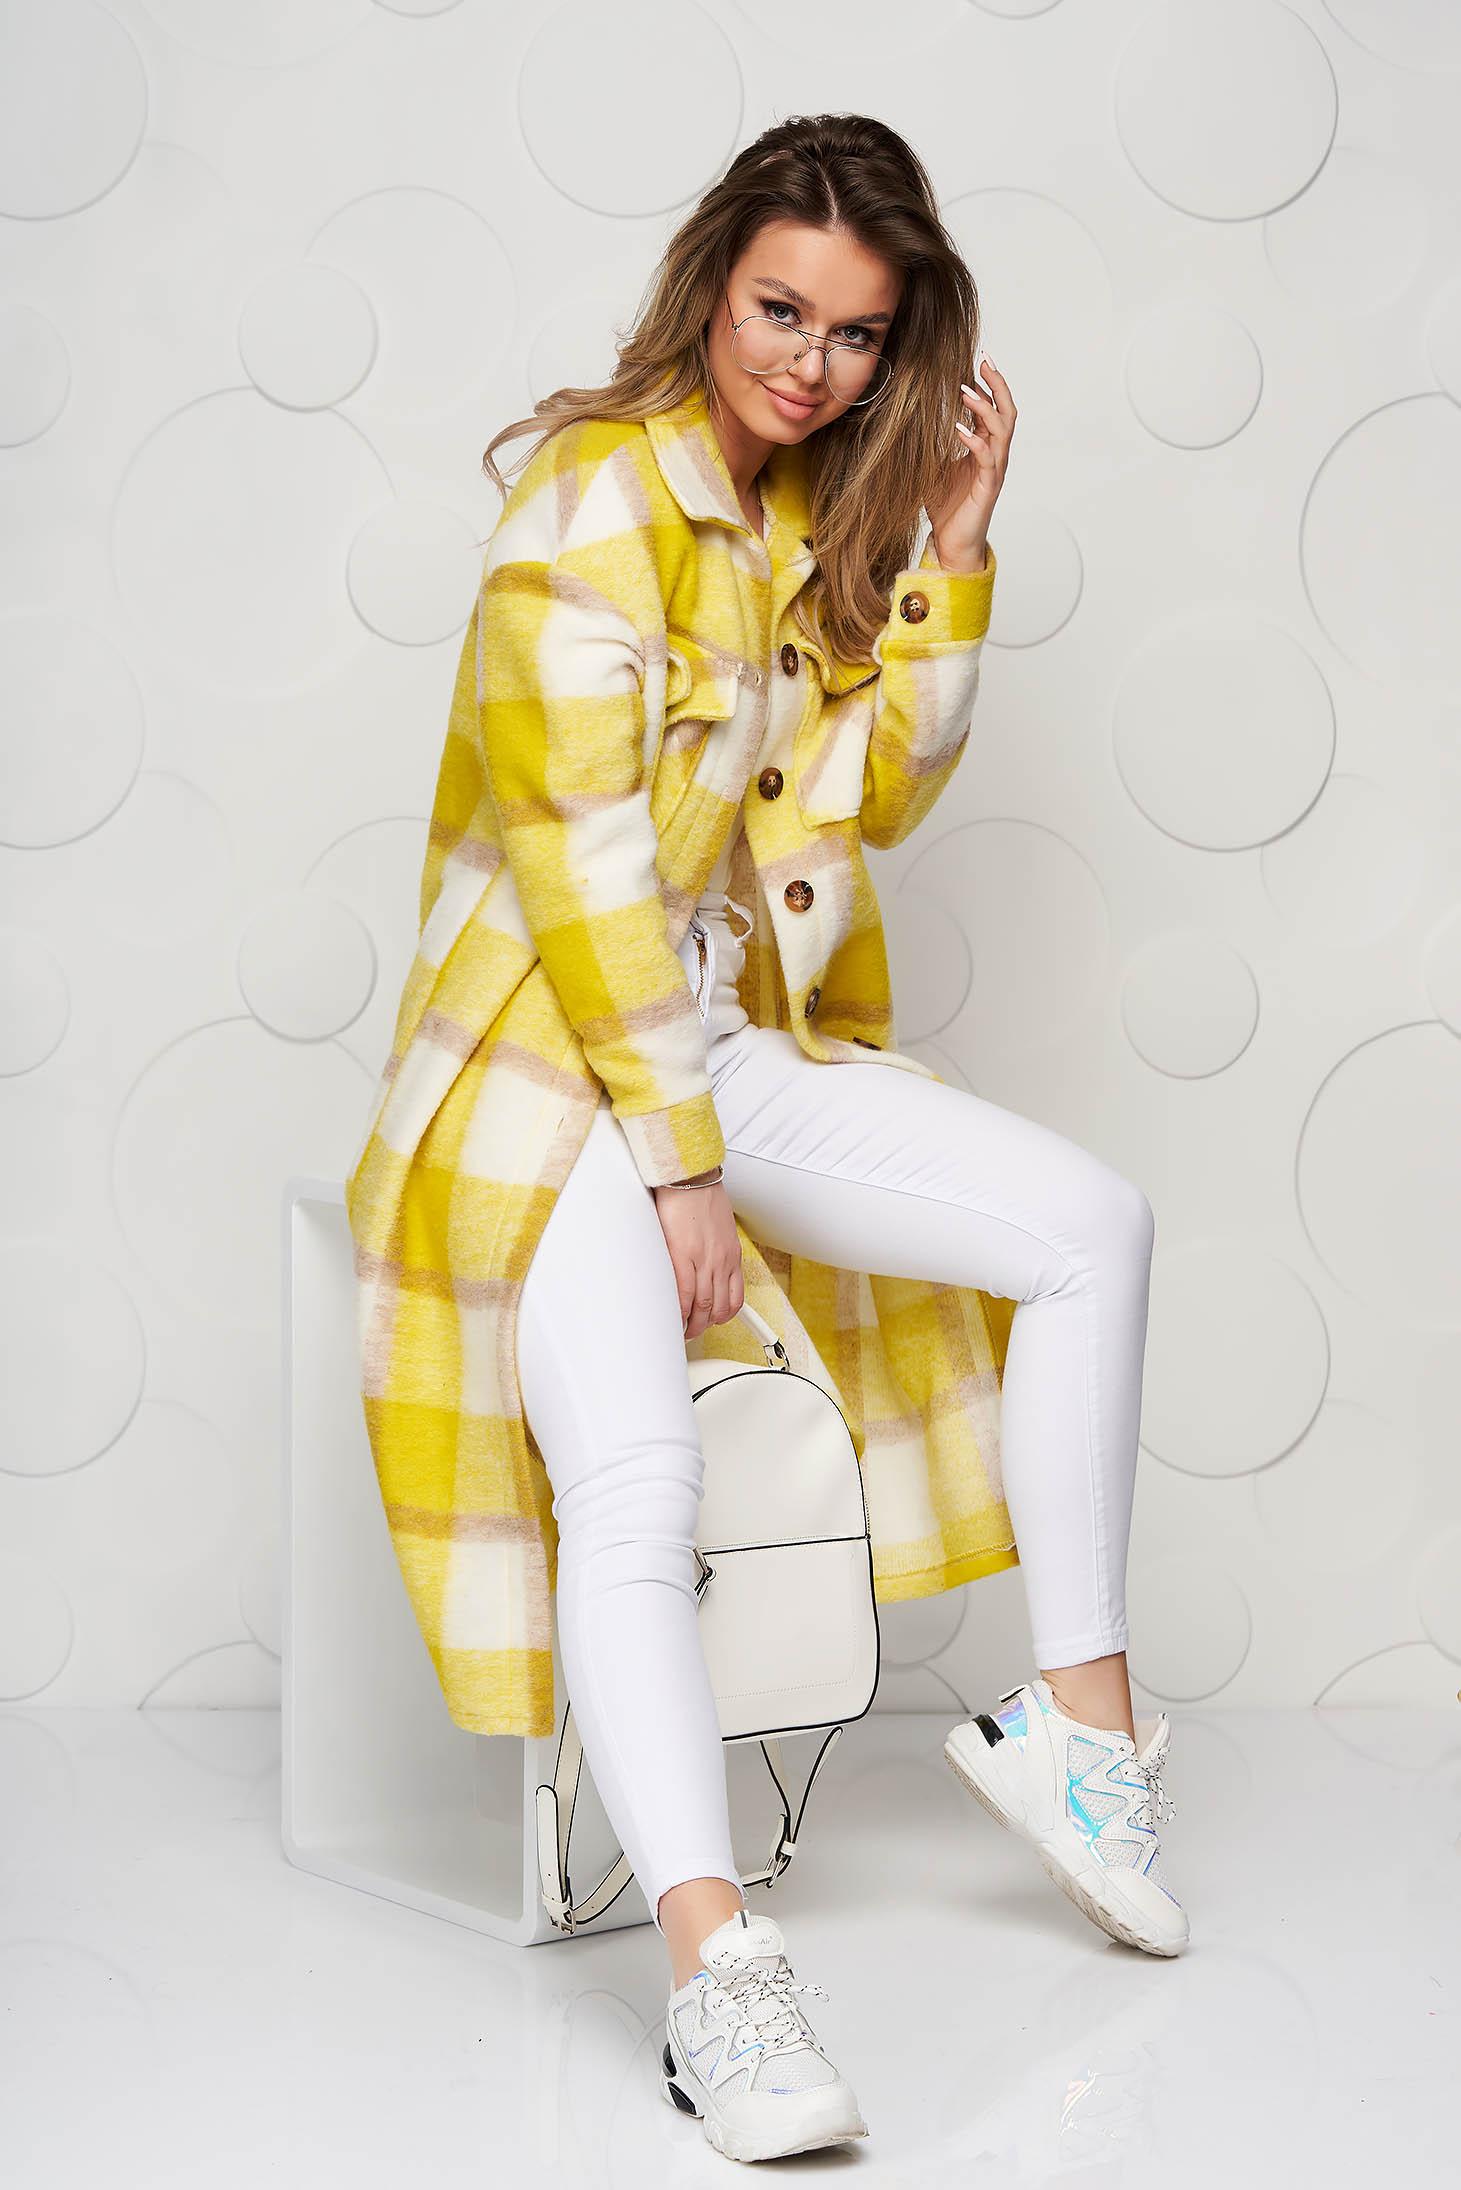 Jacheta tip camasa galbena in carouri cu croi larg din material pufos